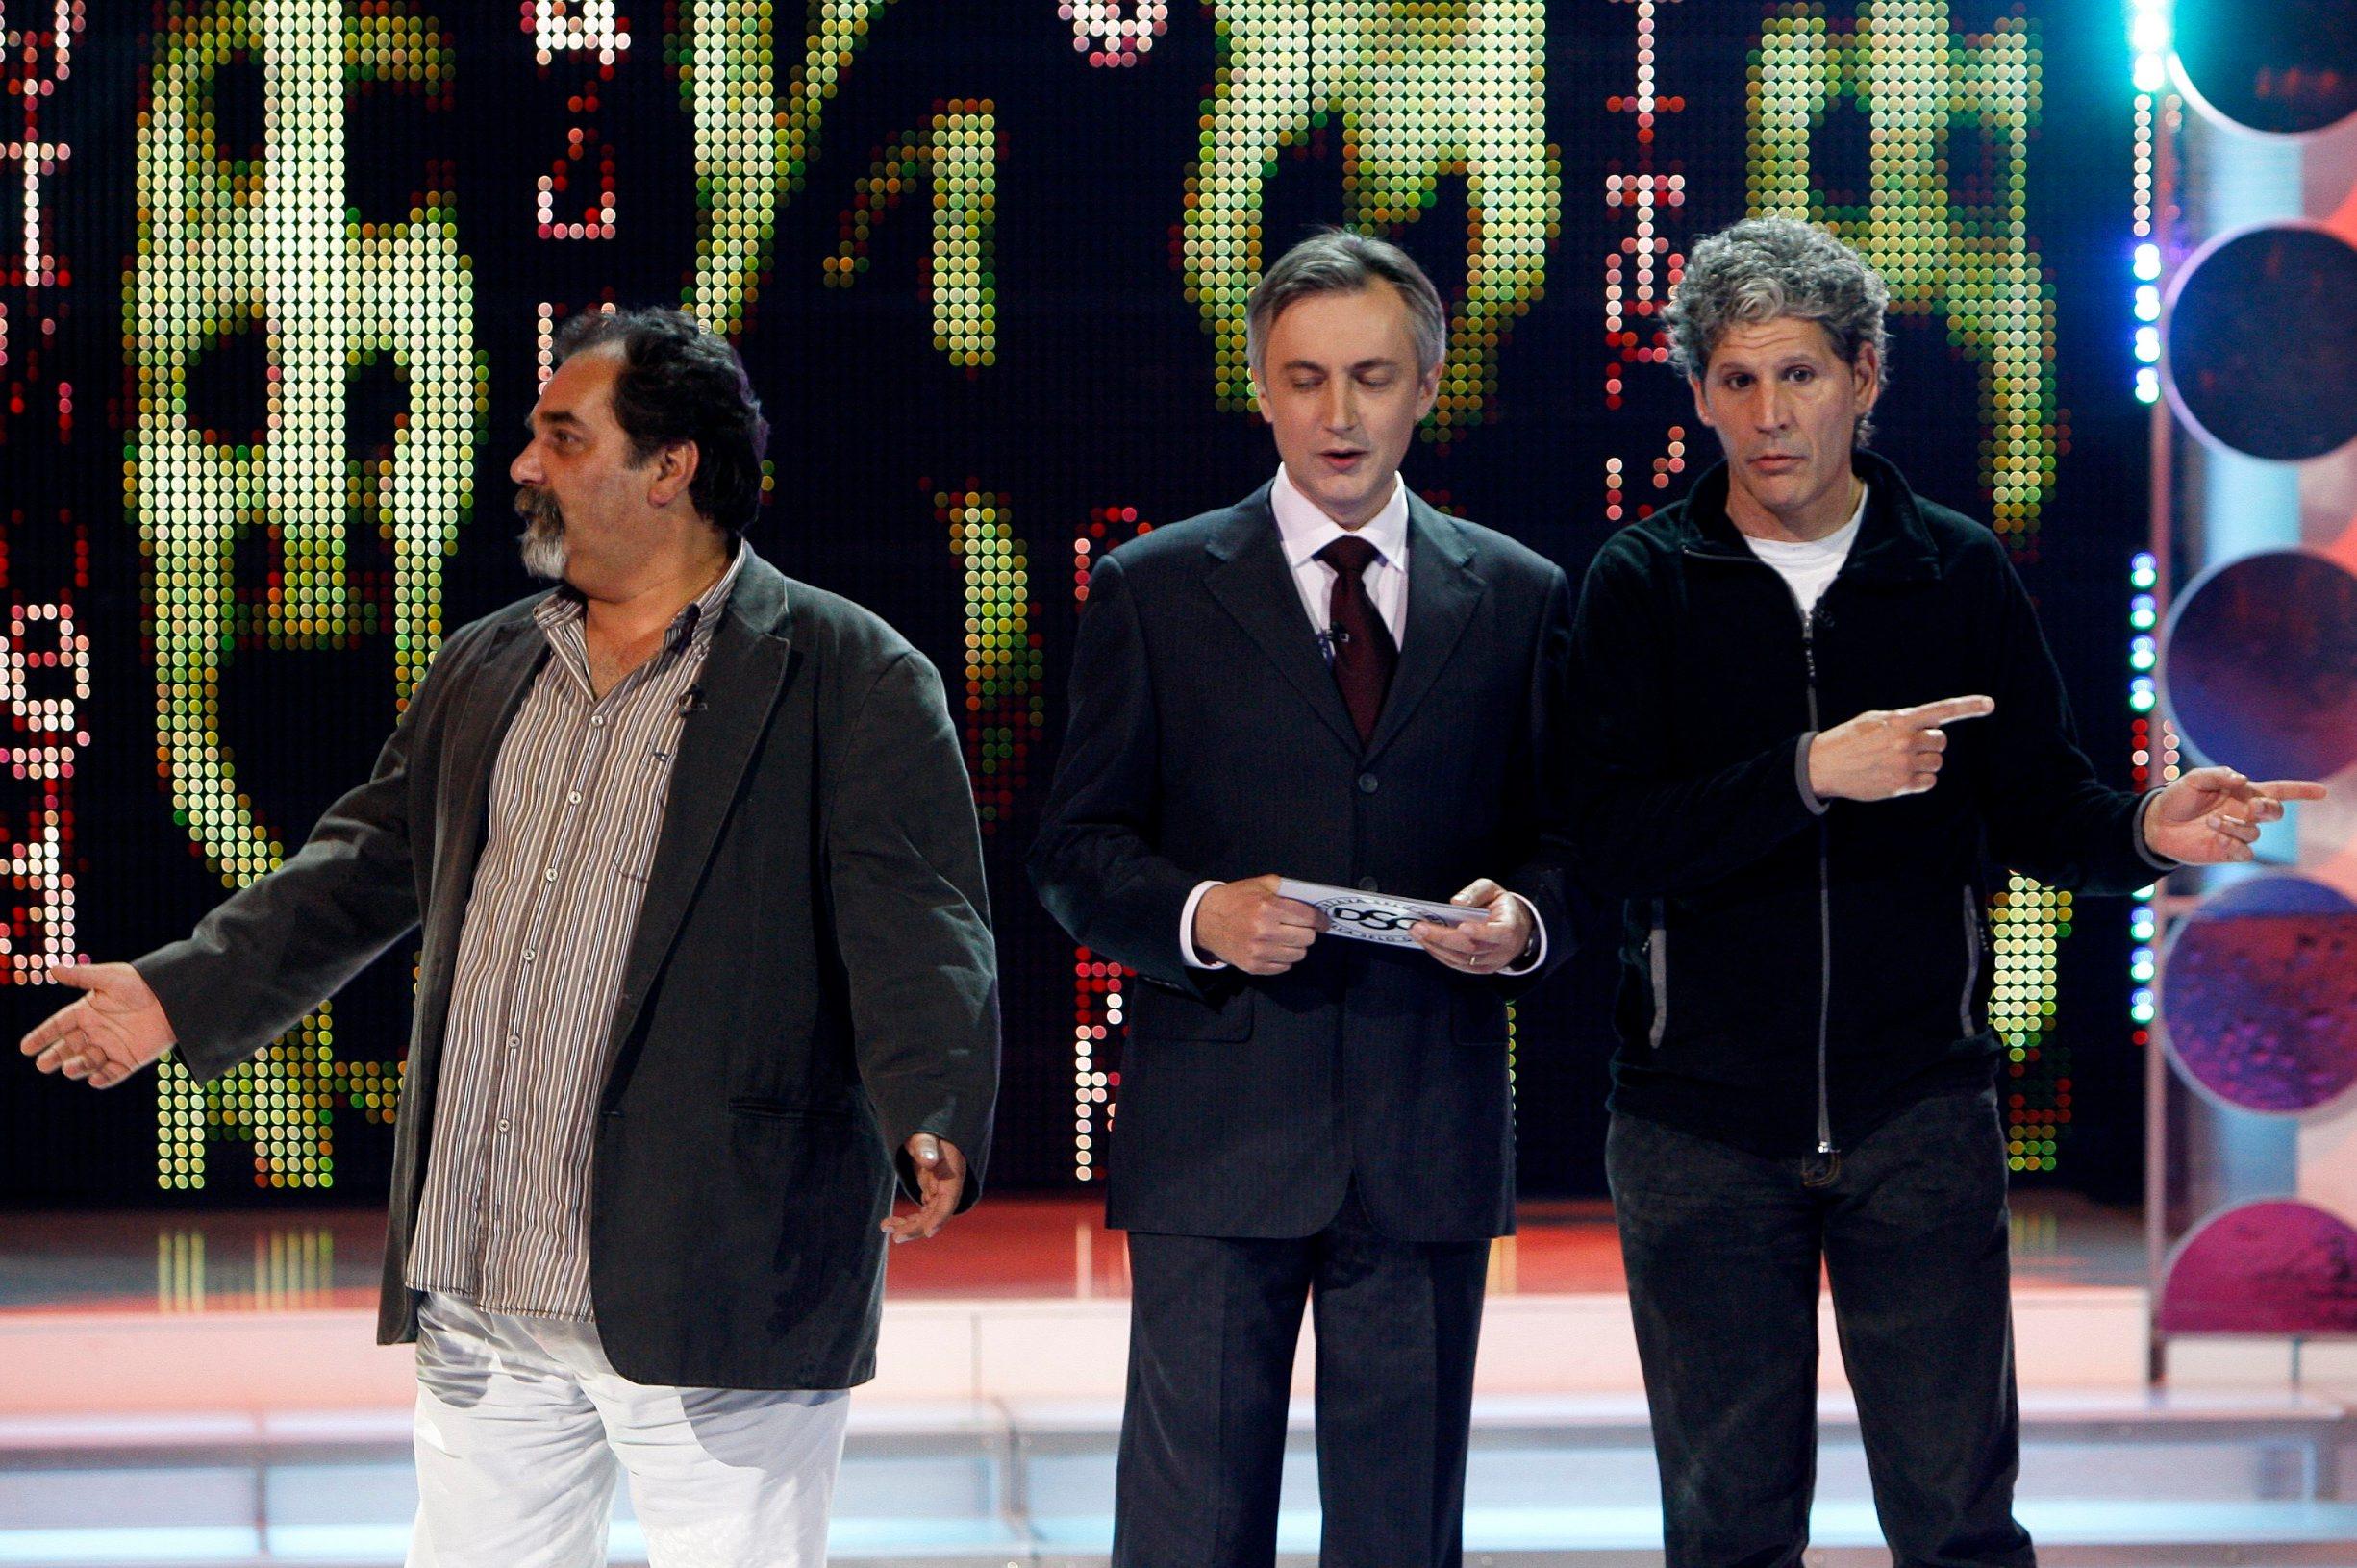 Zagreb, 200410. HTV, studio 10. Reportaza sa snimanja showa Miroslava Skore, prve polufinalne emisije